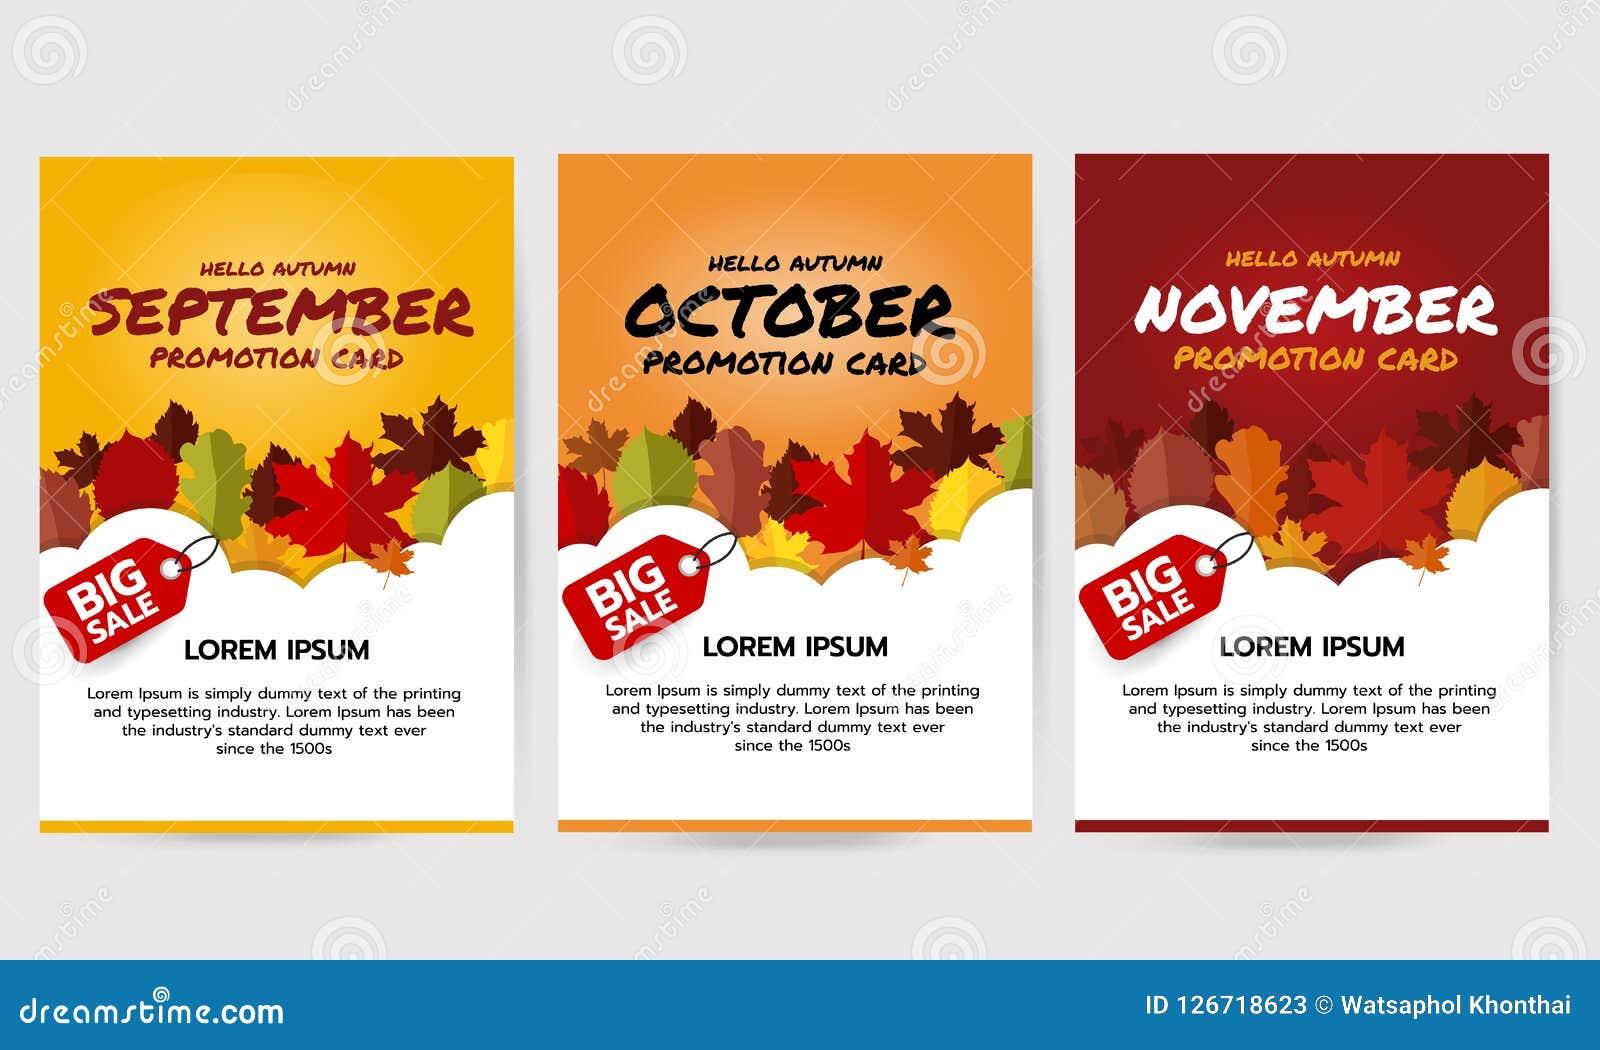 Set of hello autumn banner with leaves, september, october, november promotion card. Big sale banner template. Flat vector illustr